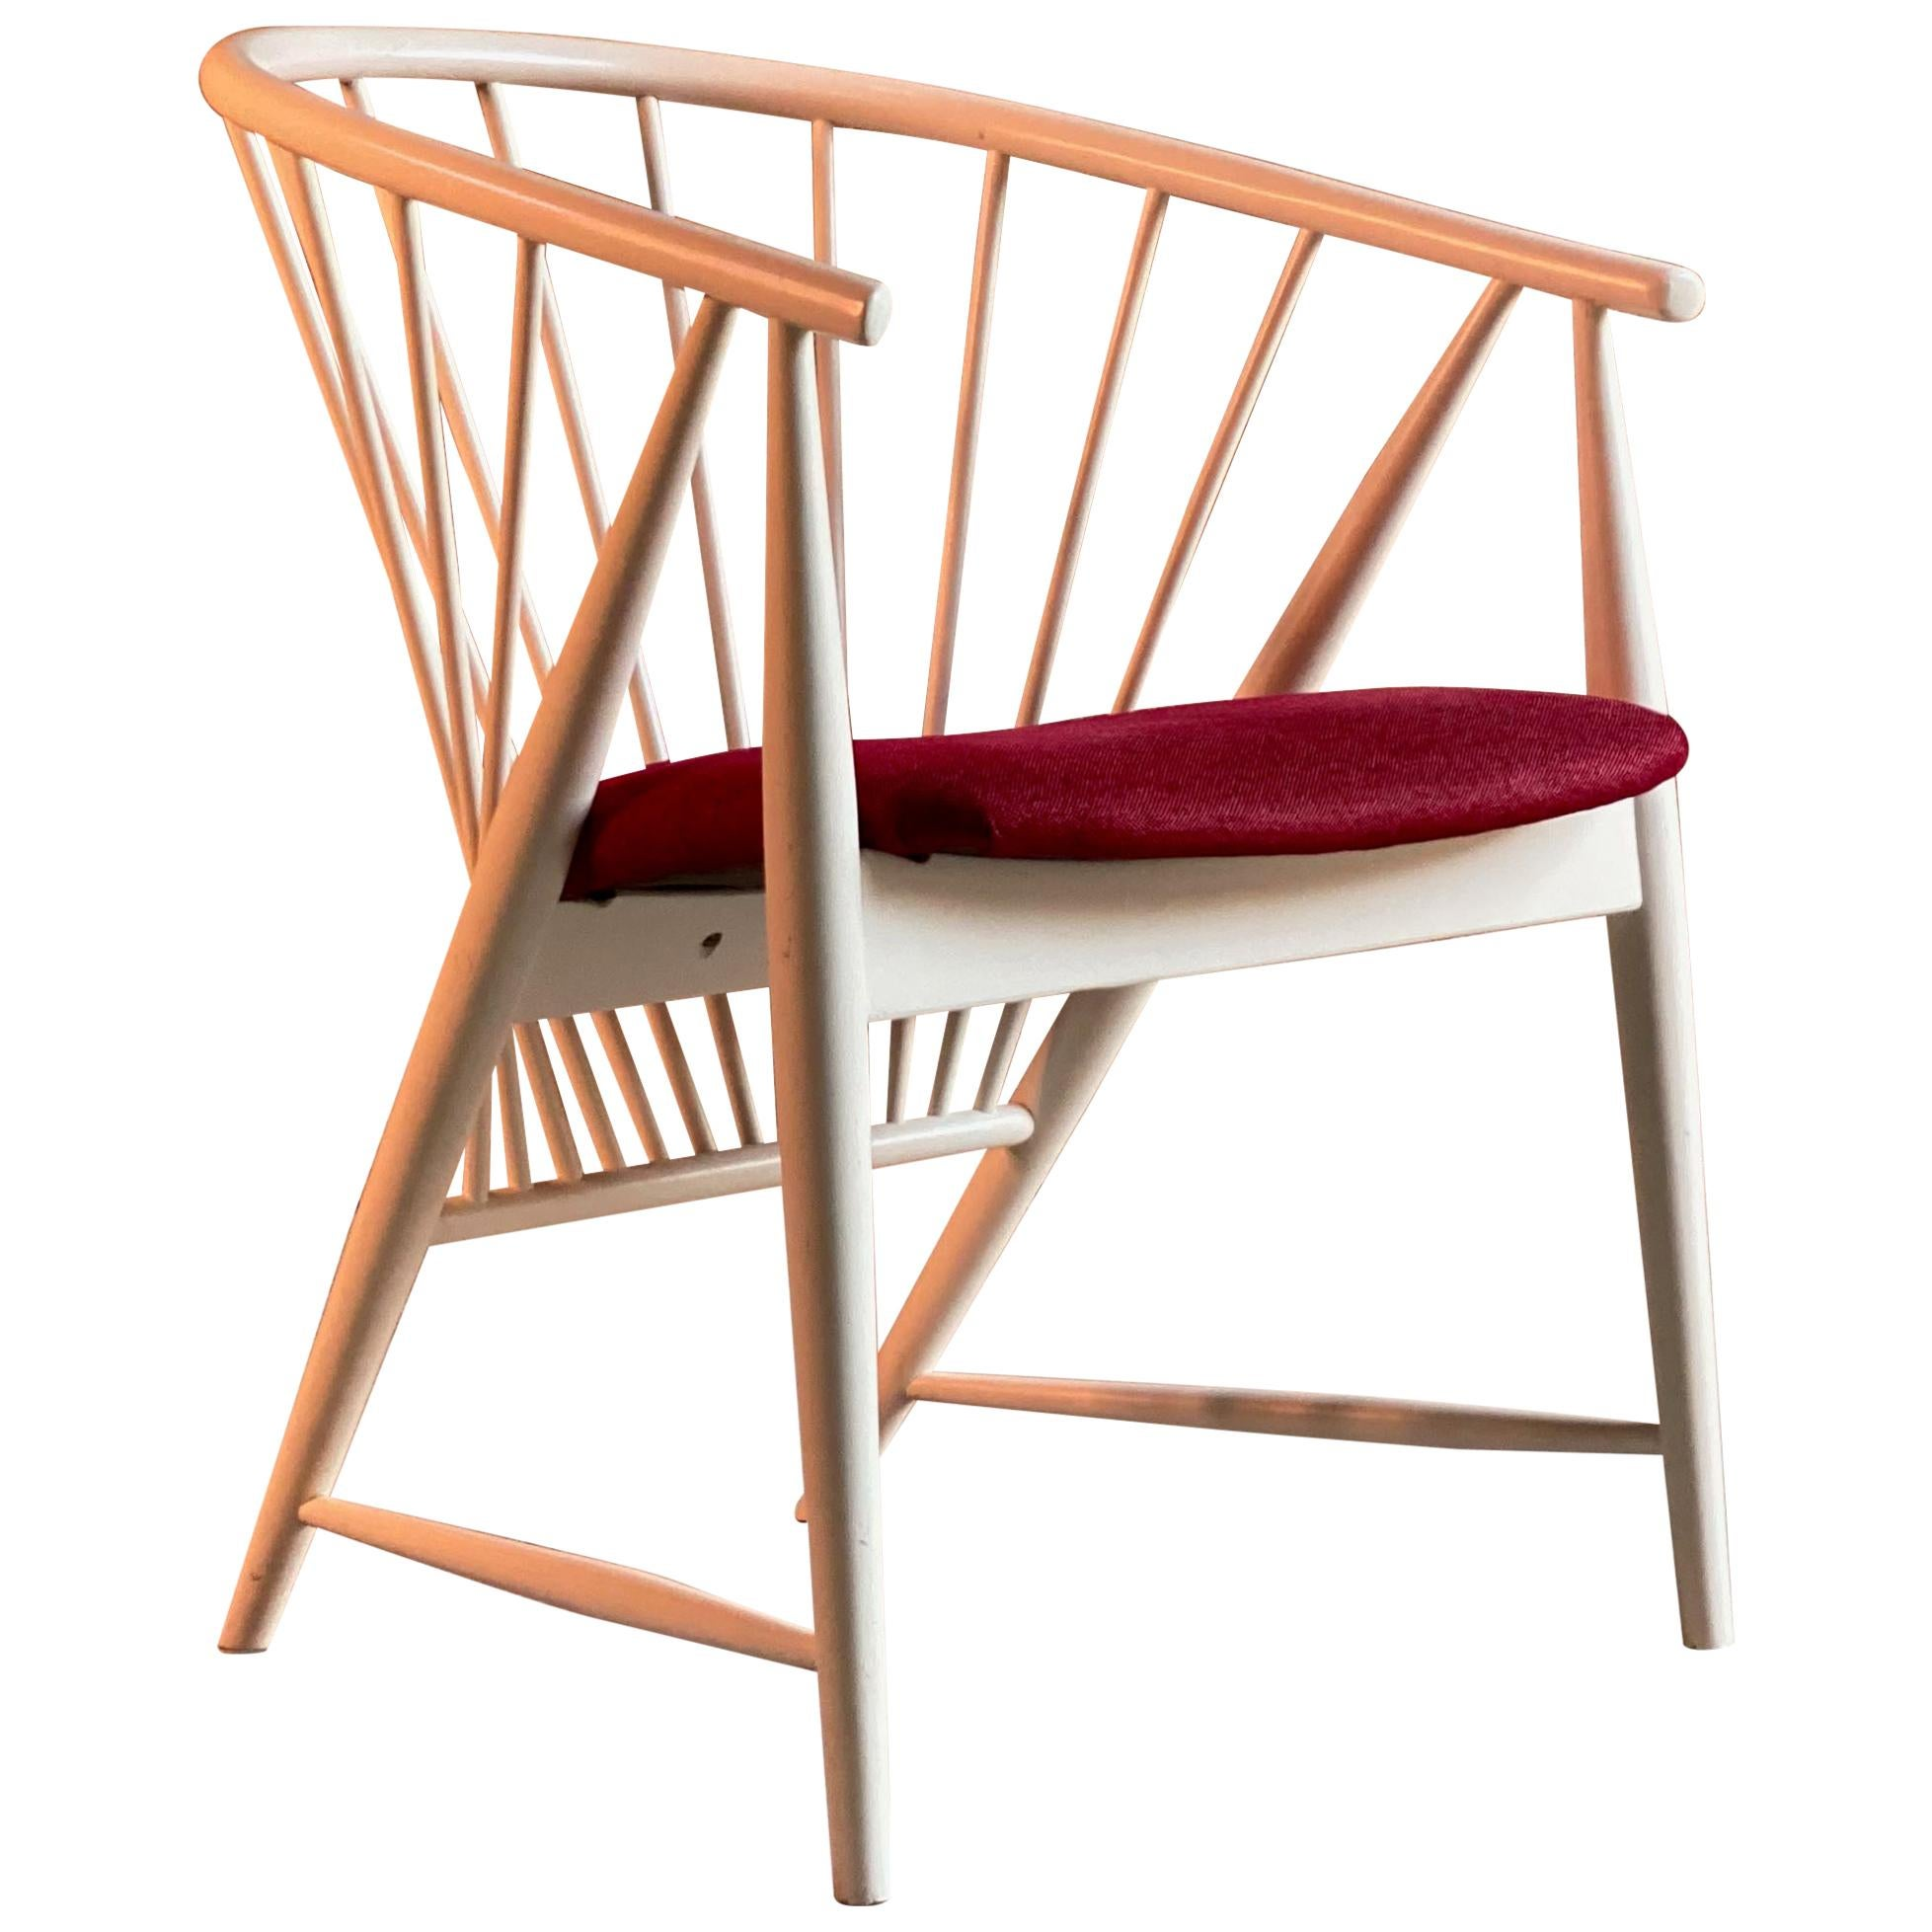 Sonna Rosen Sun Feather Chair Midcentury Design Sweden, circa 1990